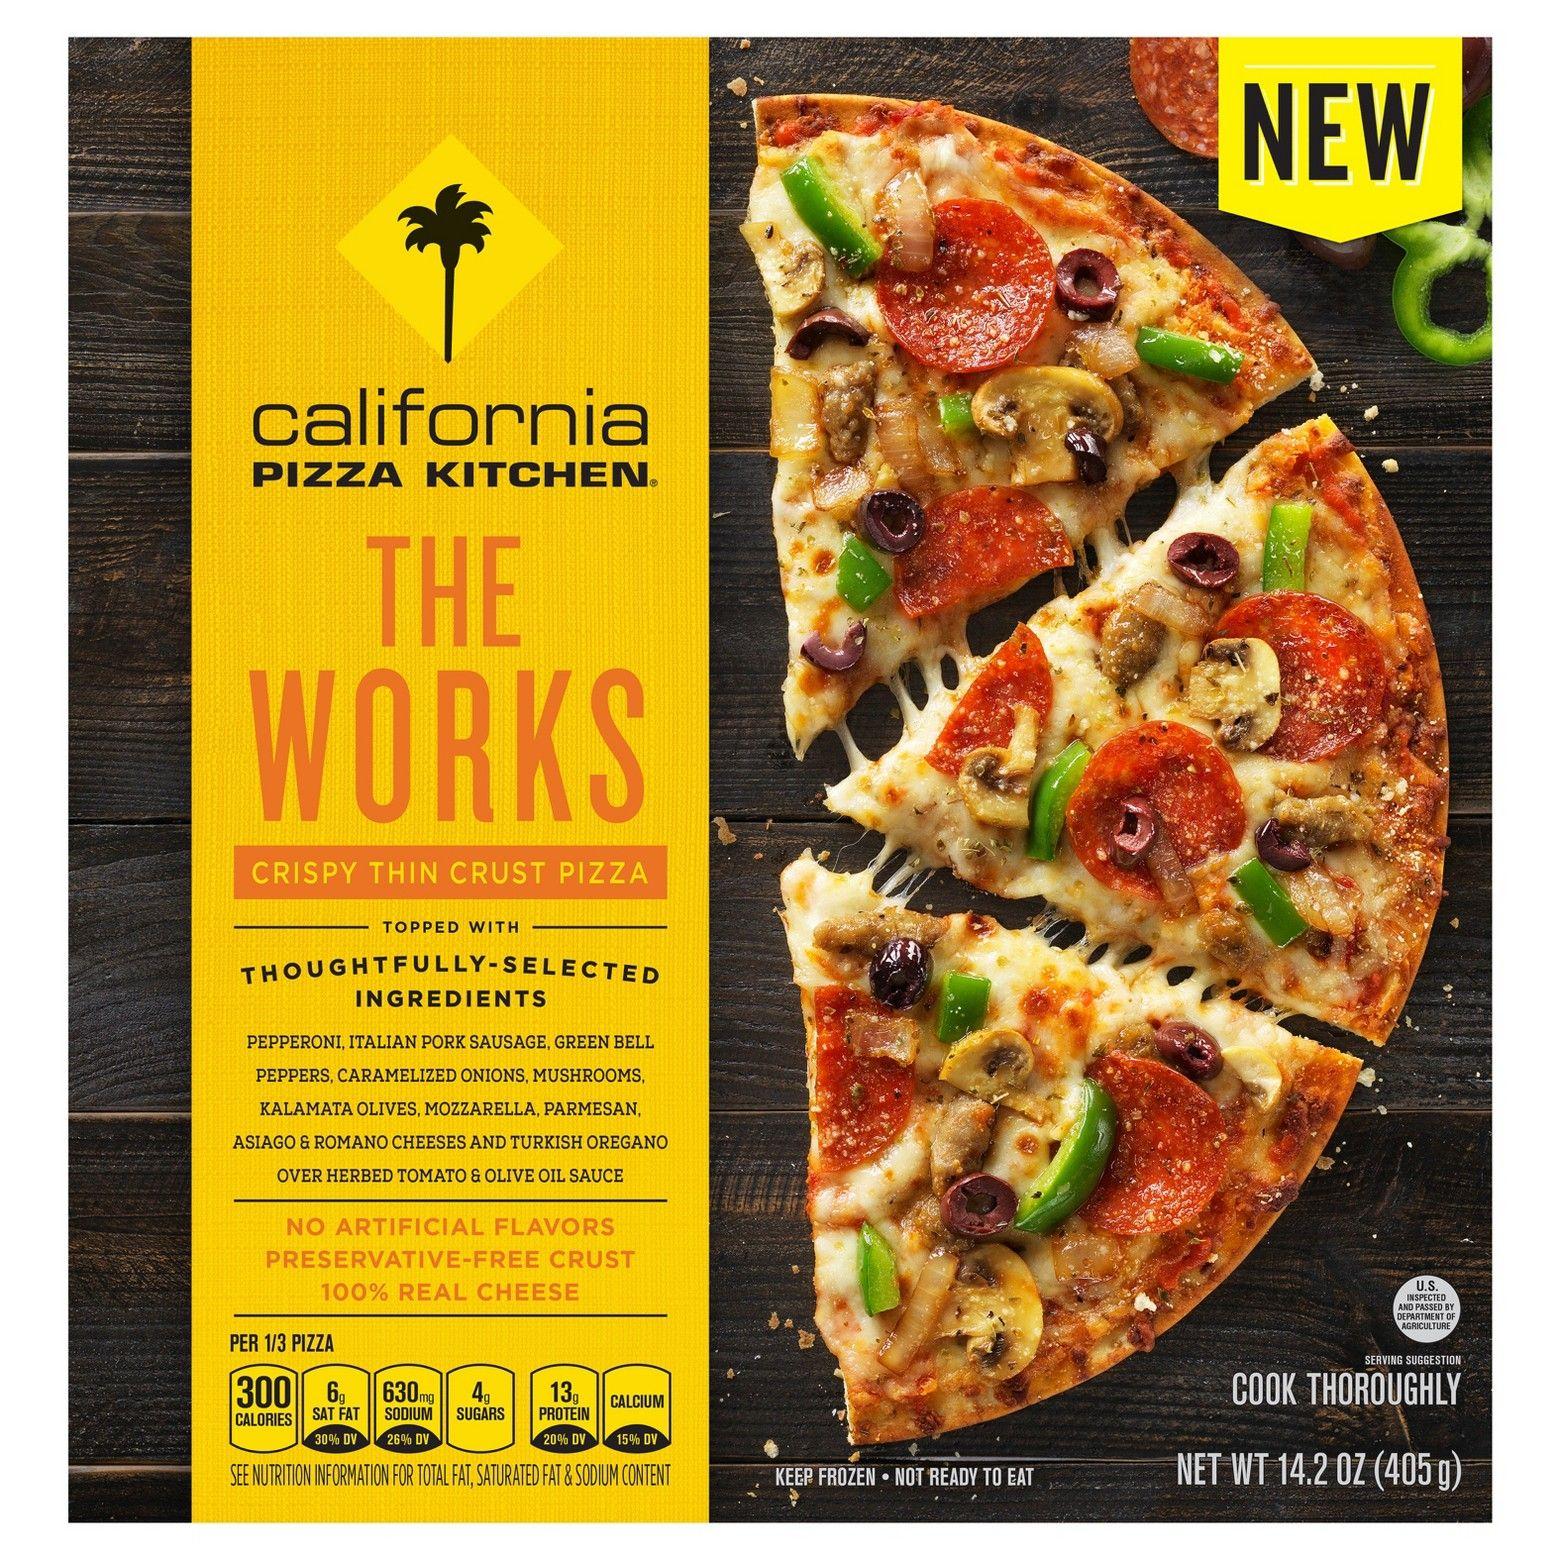 California Pizza Kitchen The Works Crispy Thin Crust Frozen Pizza